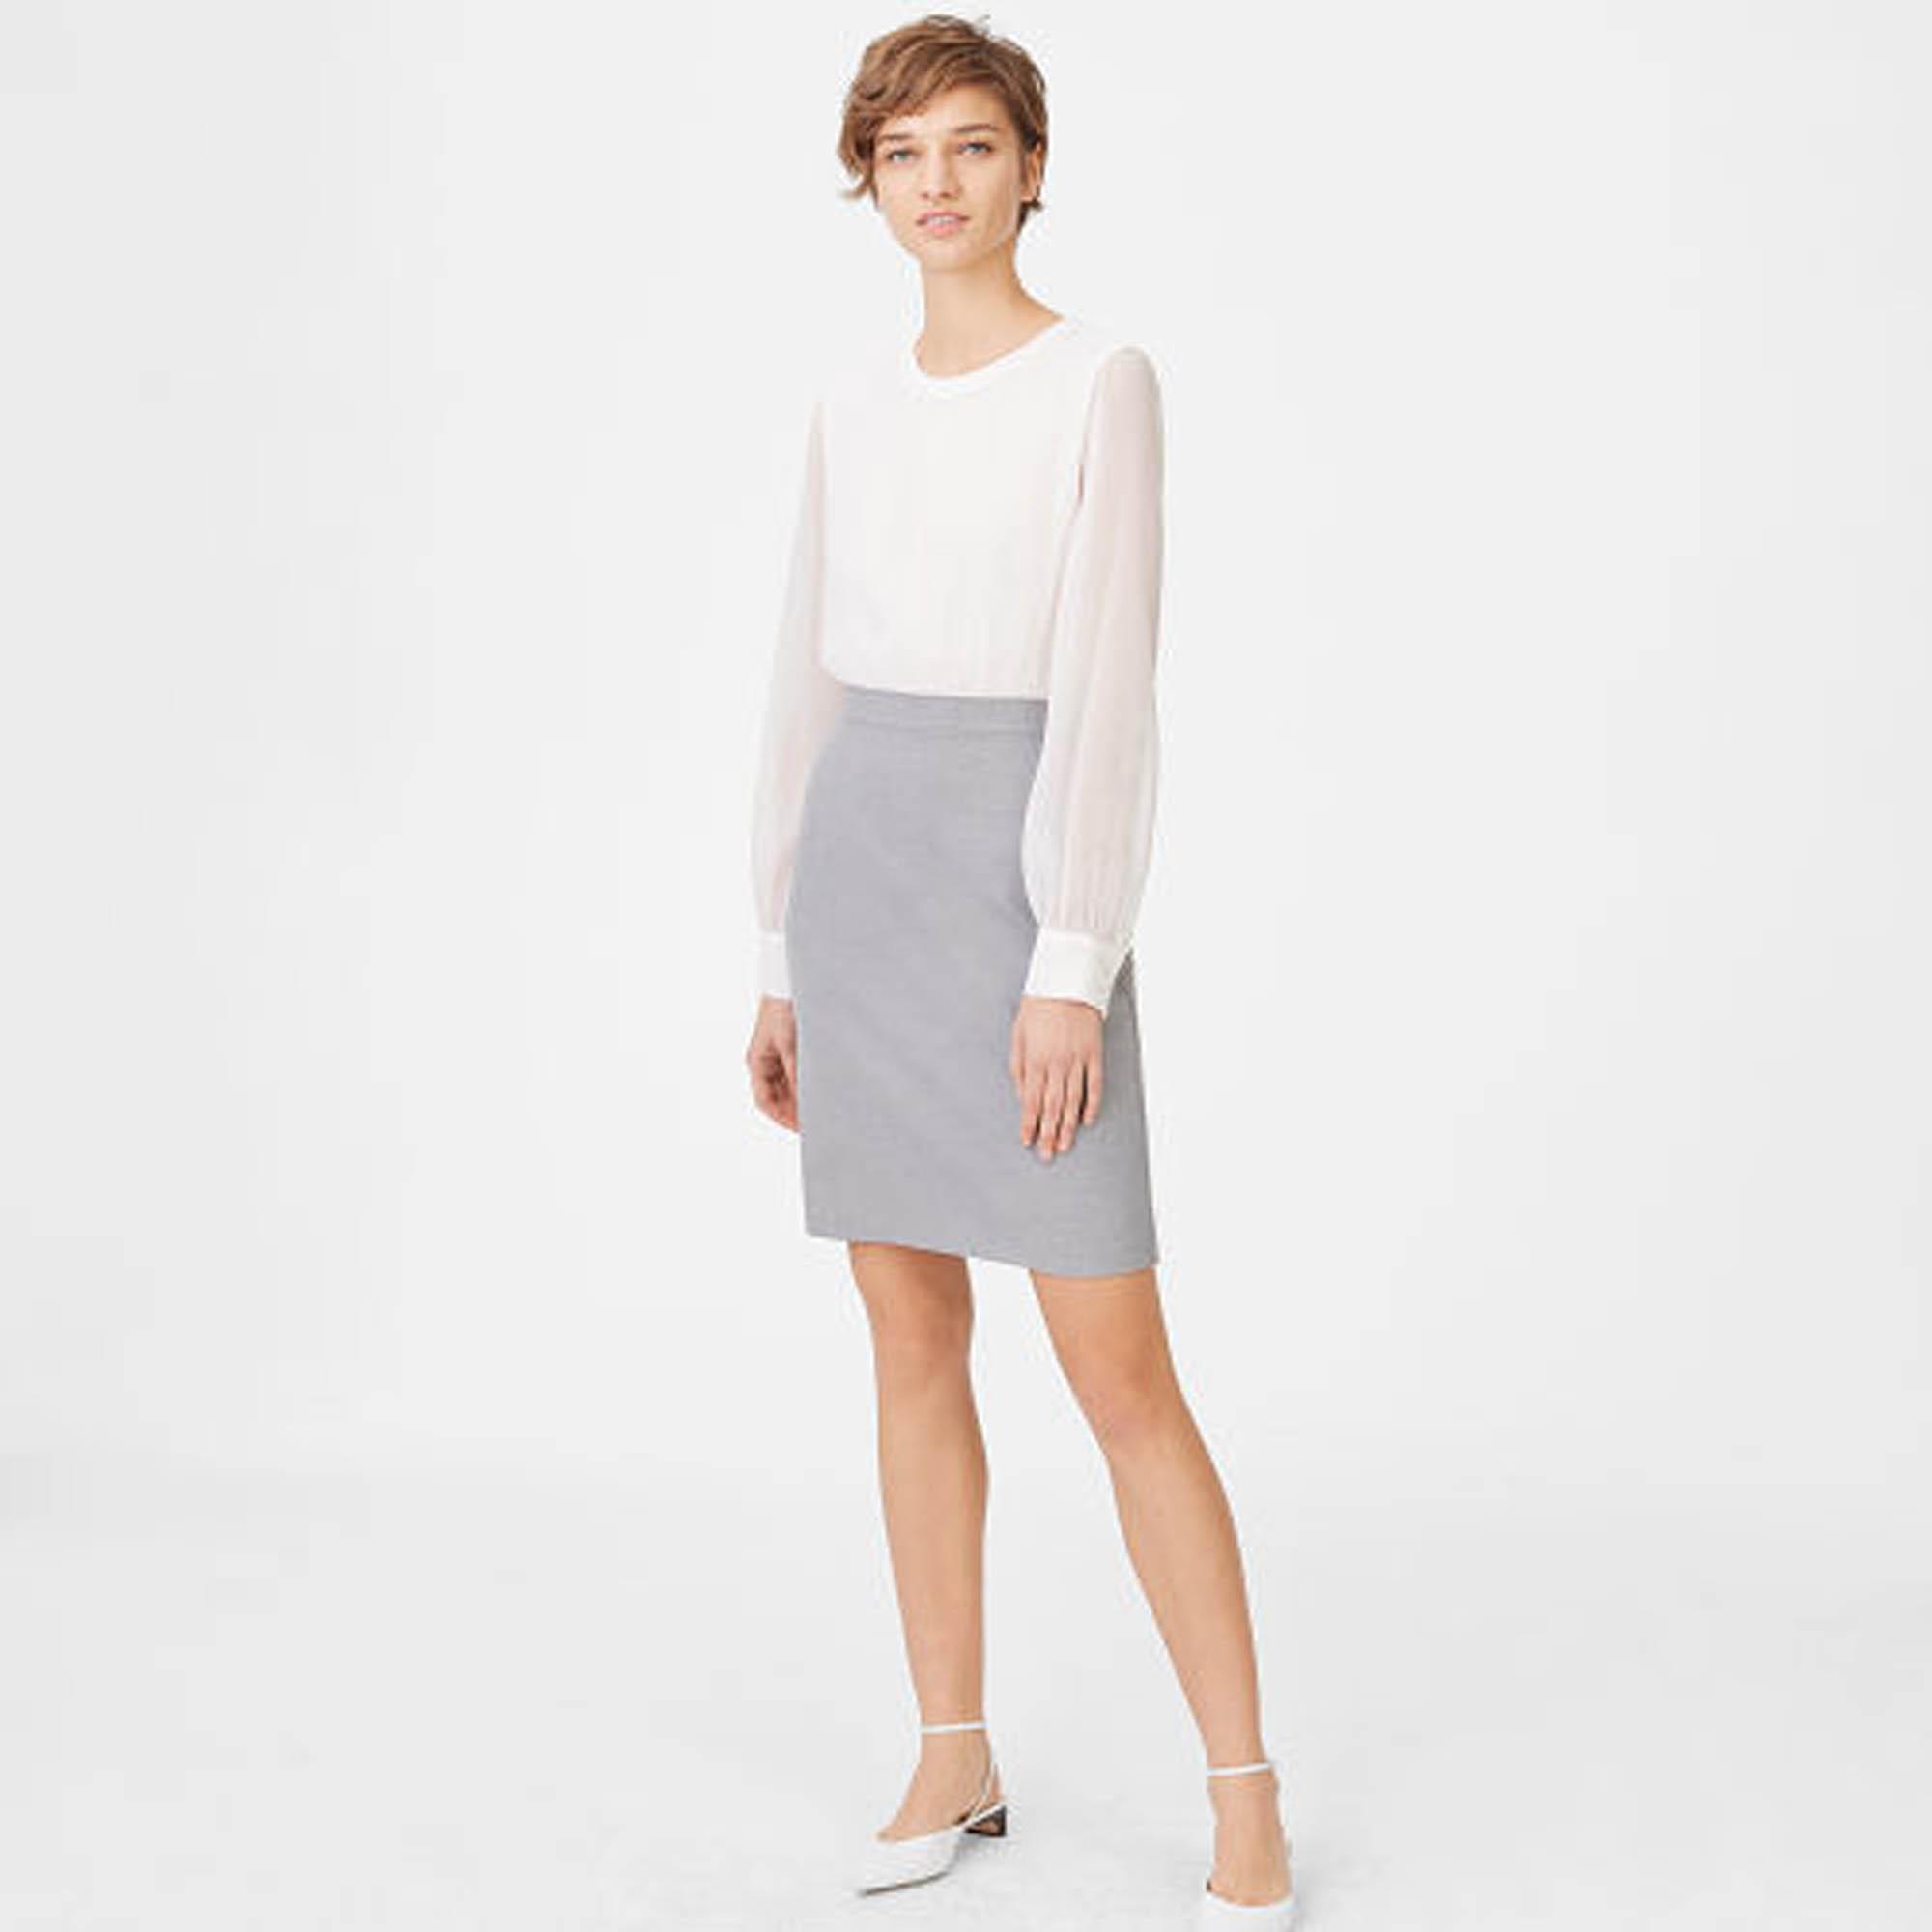 Mereelie Dress   HK$2,390